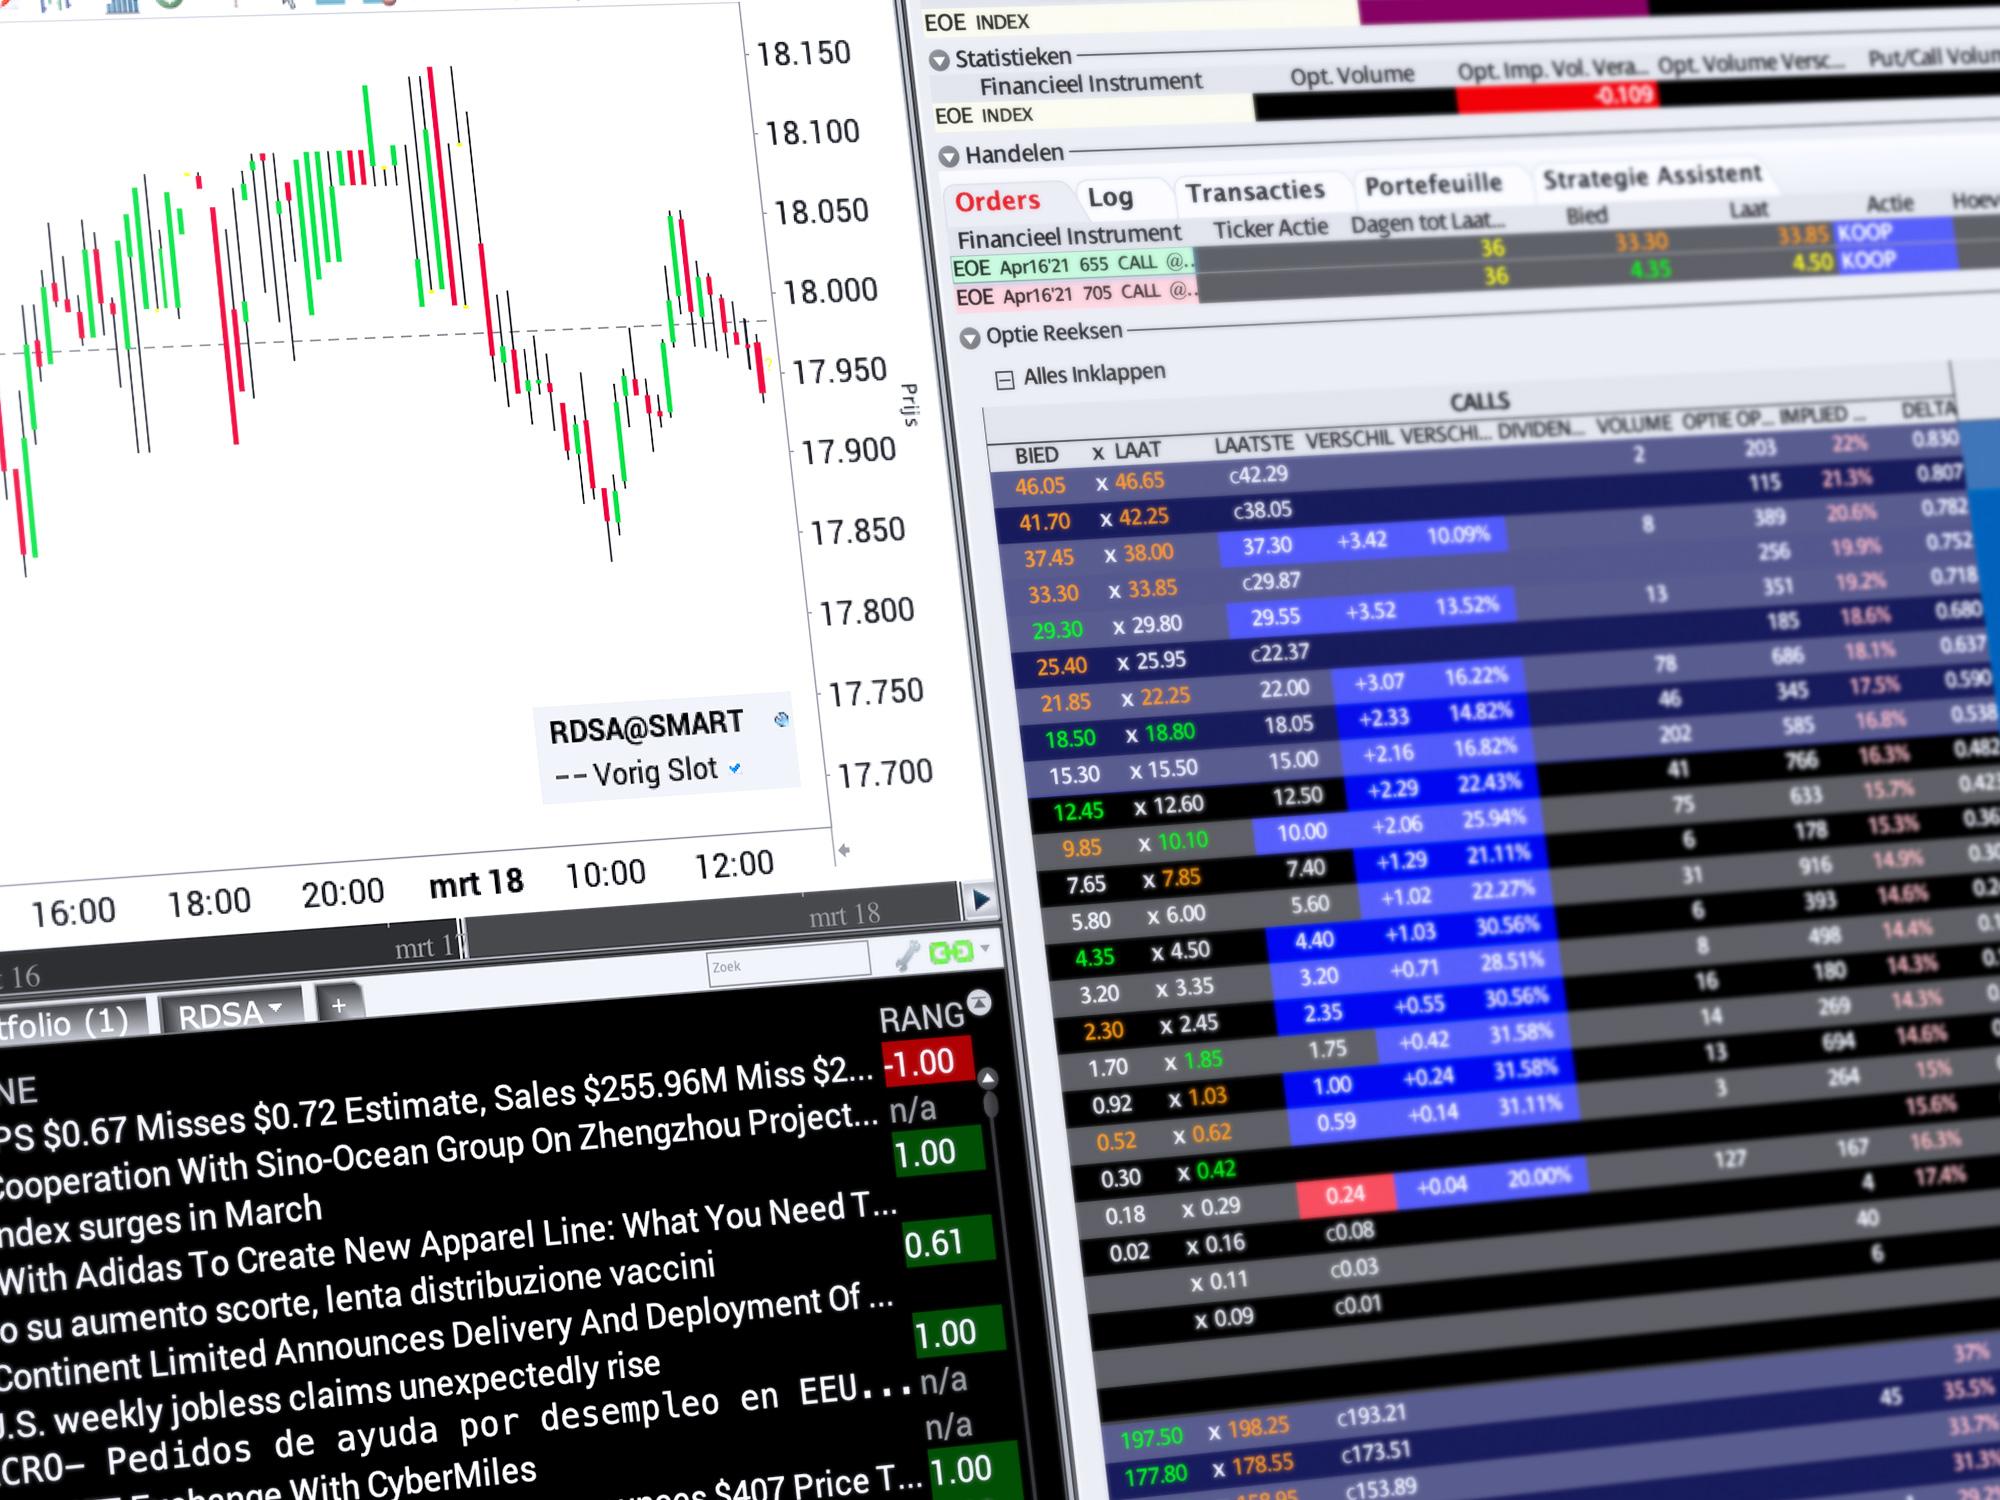 Handelsplatform Trader Workstation - TWS Mosaic